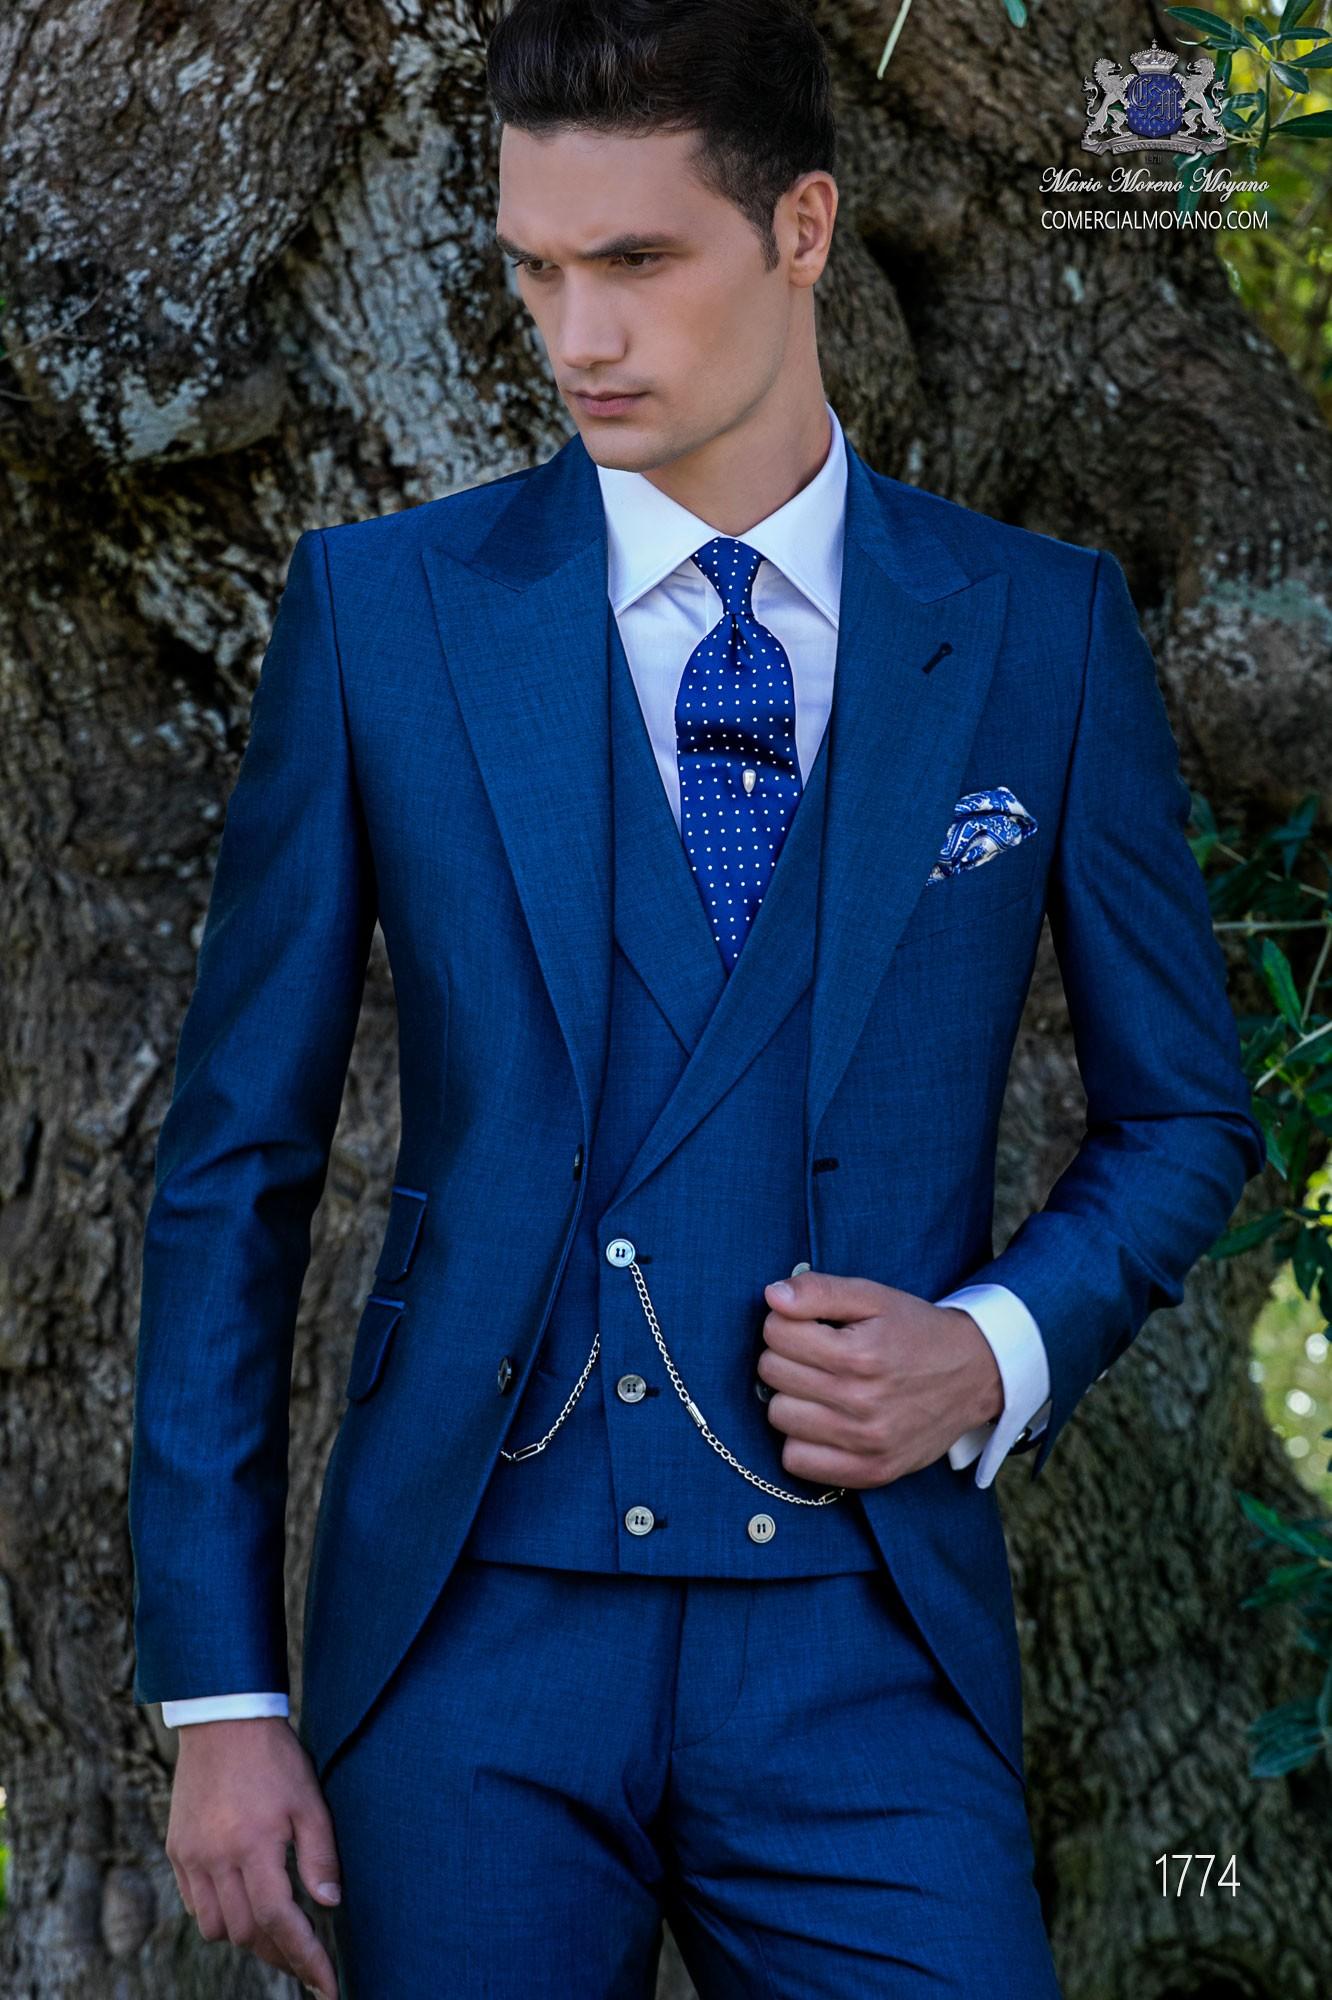 costume bleu royal mohair laine alpaga ottavio nuccio gala. Black Bedroom Furniture Sets. Home Design Ideas